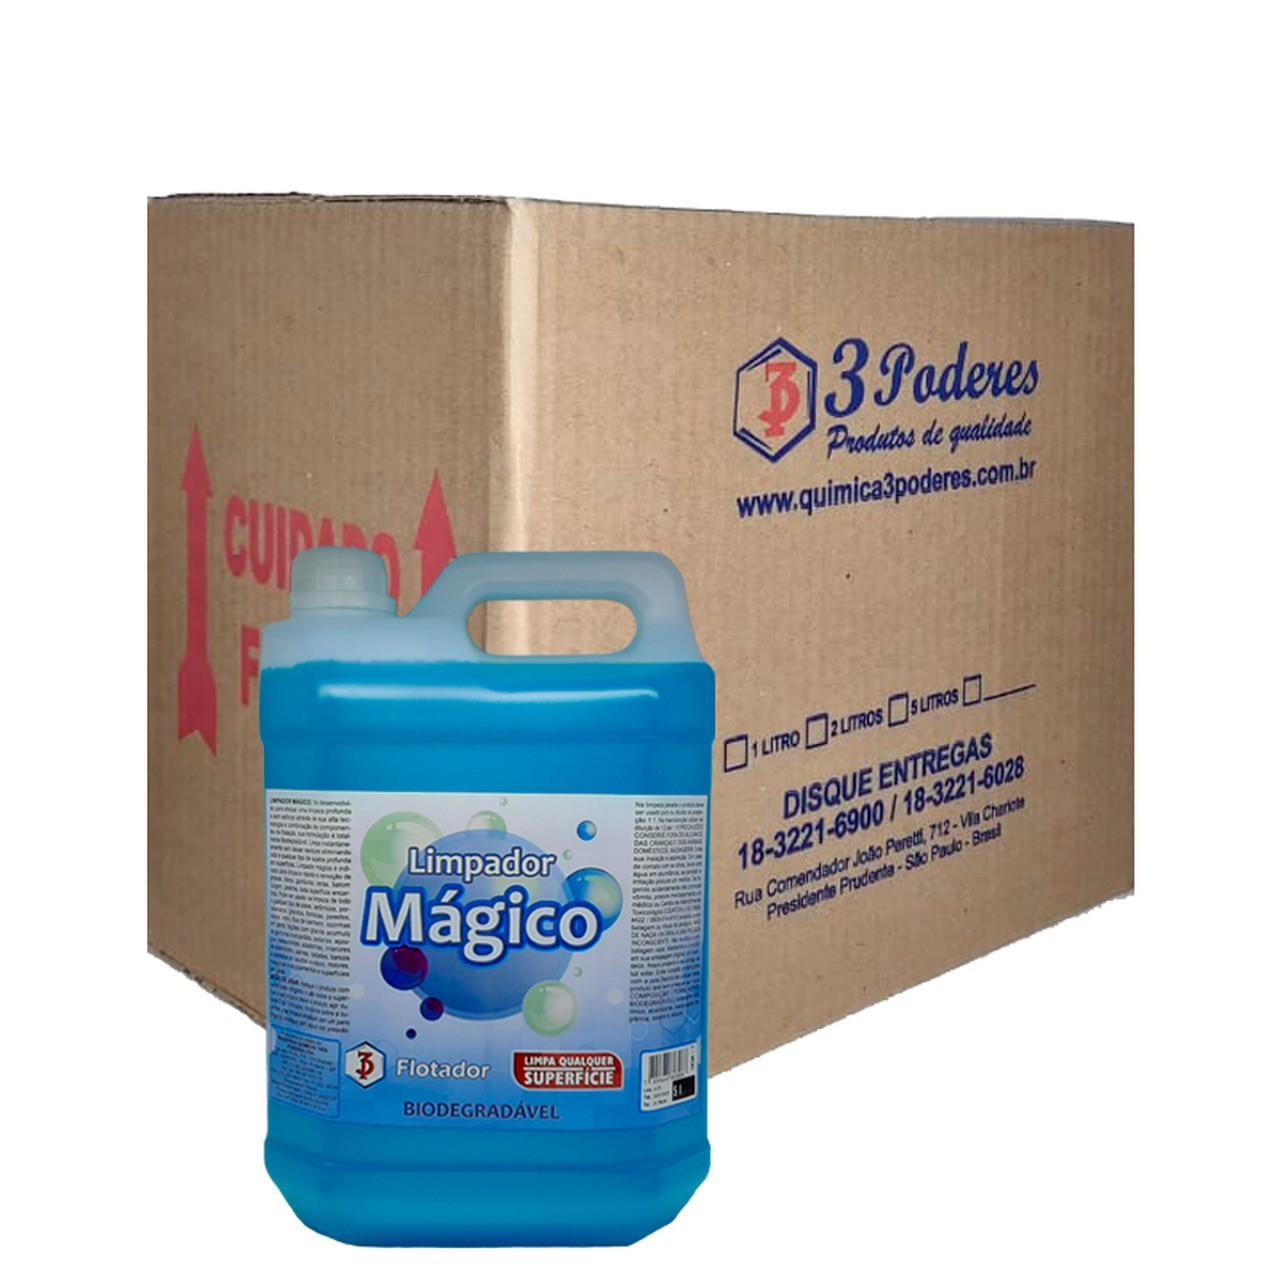 Limpador Mágico 3 Poderes 5LTS - Flotador Multiuso Biodegradável - Caixa com 4 Un.